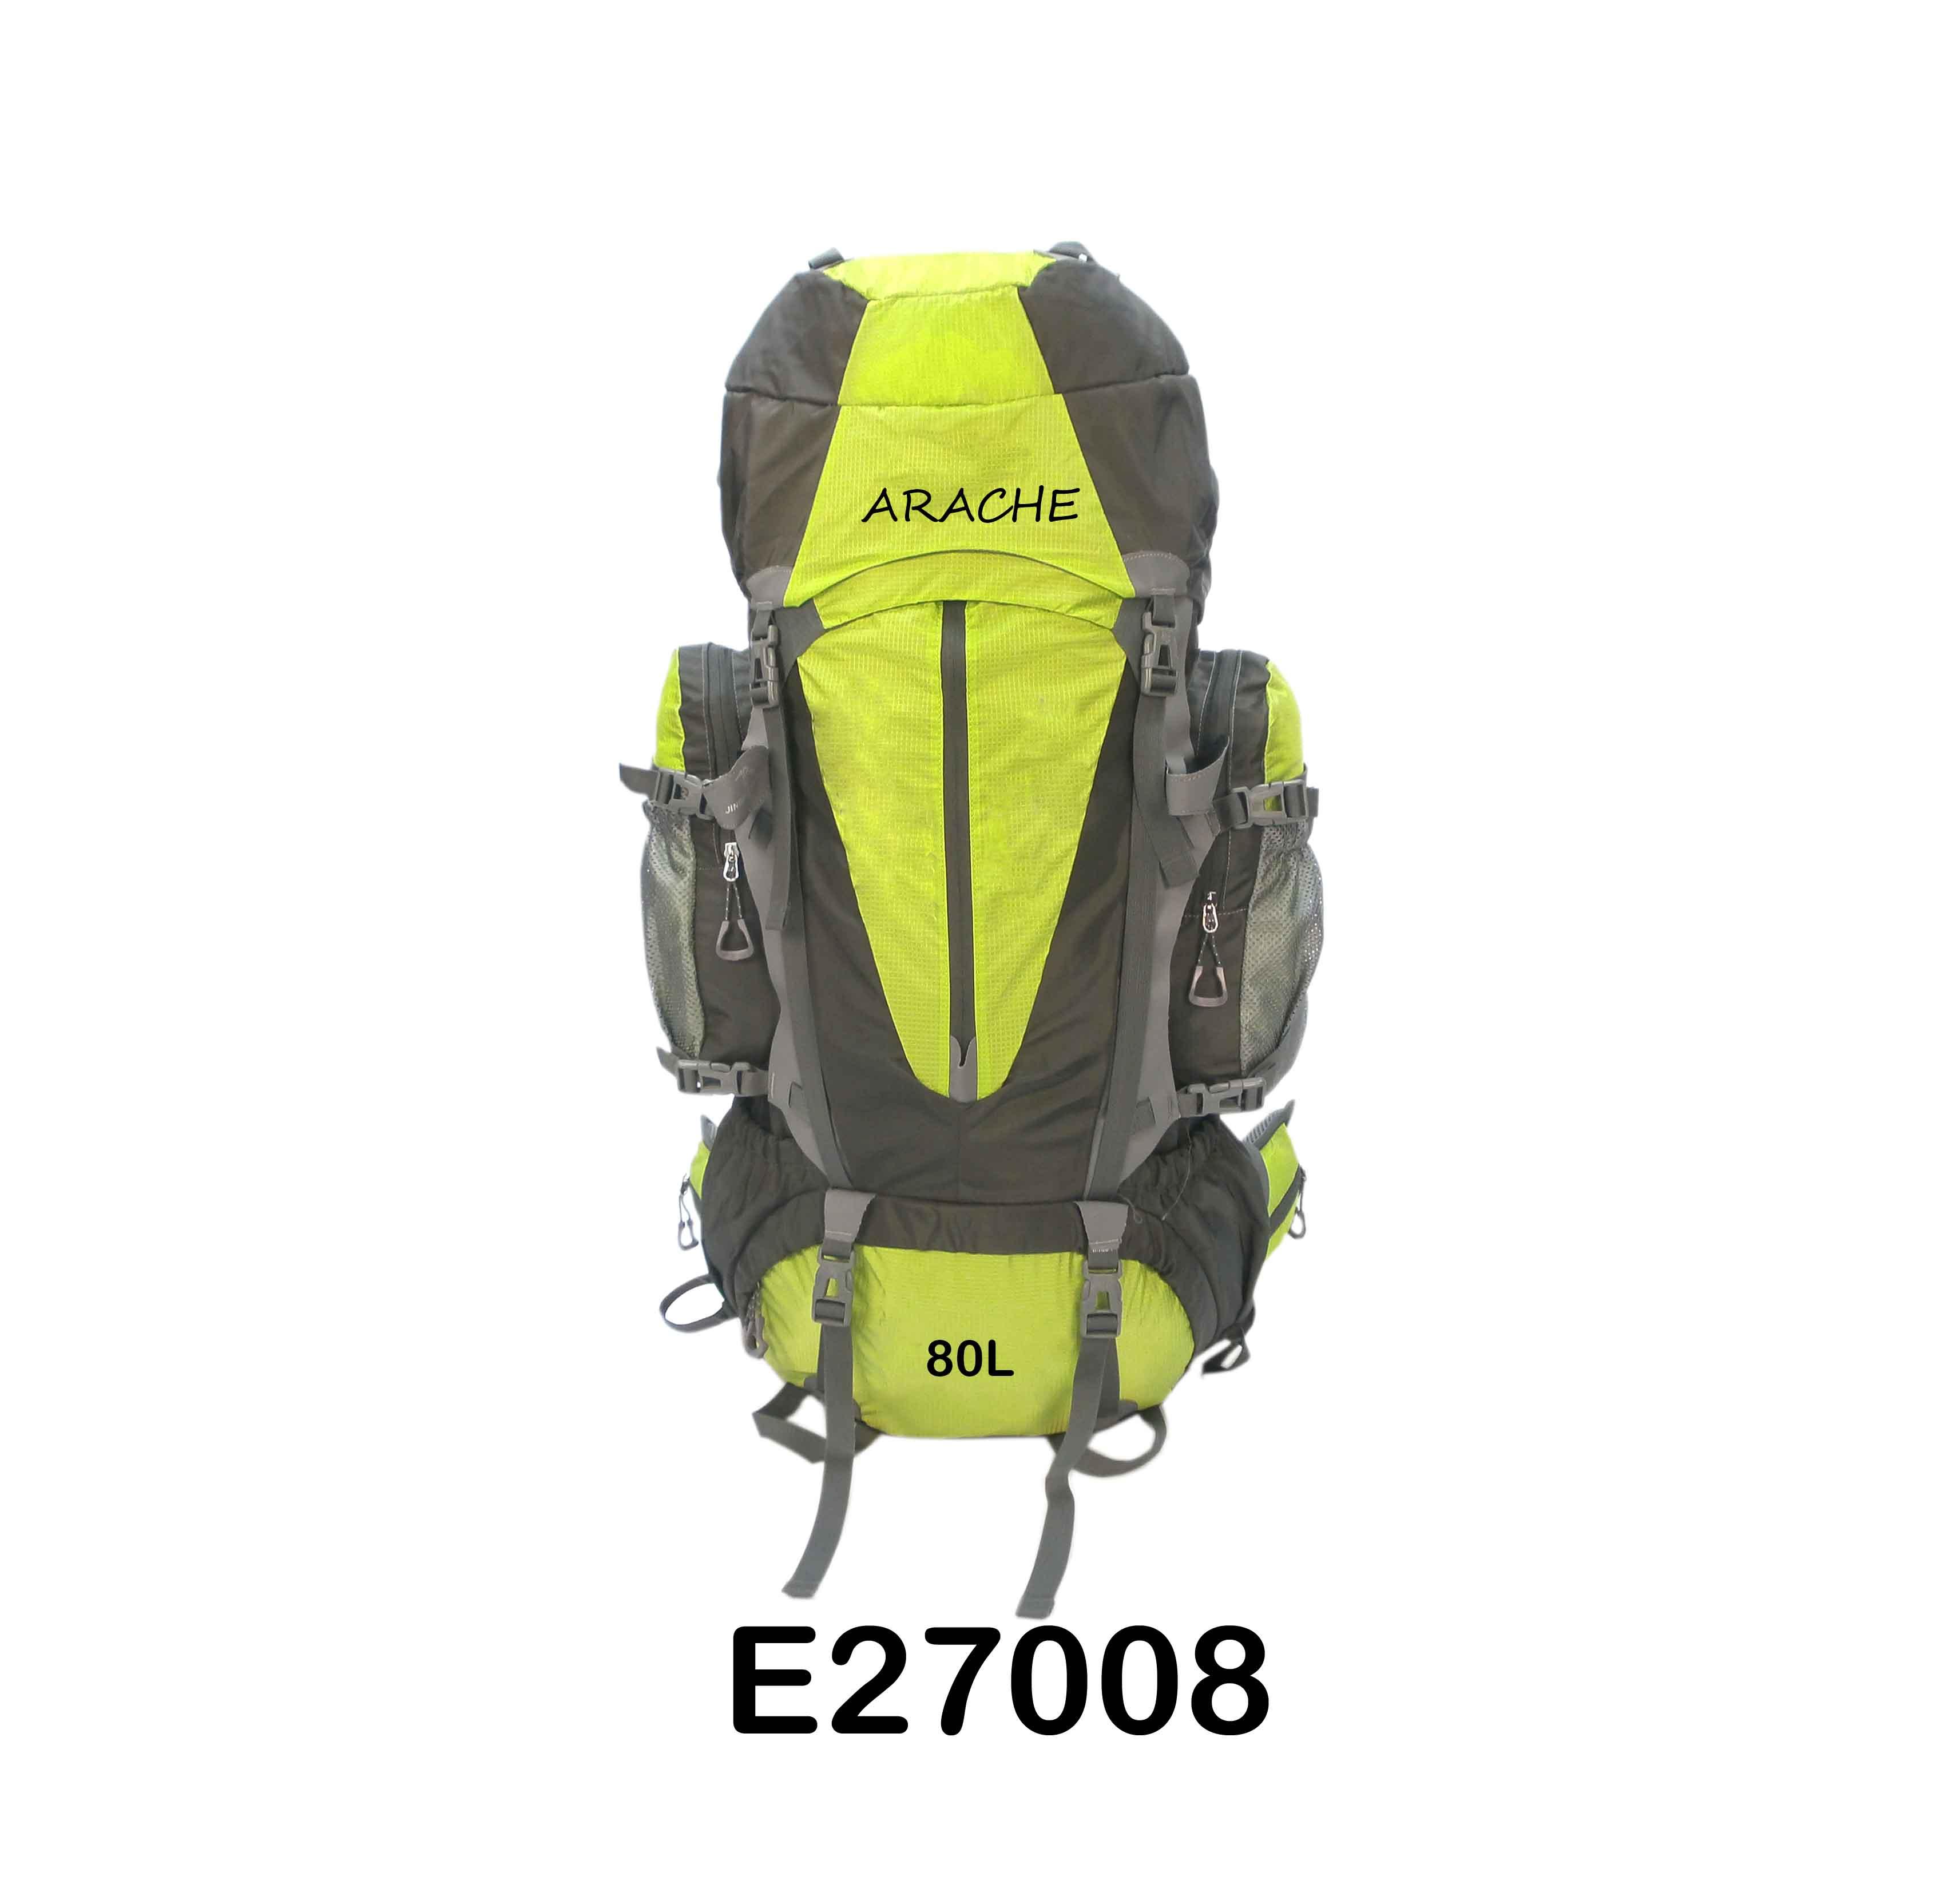 E27008 ARACHE